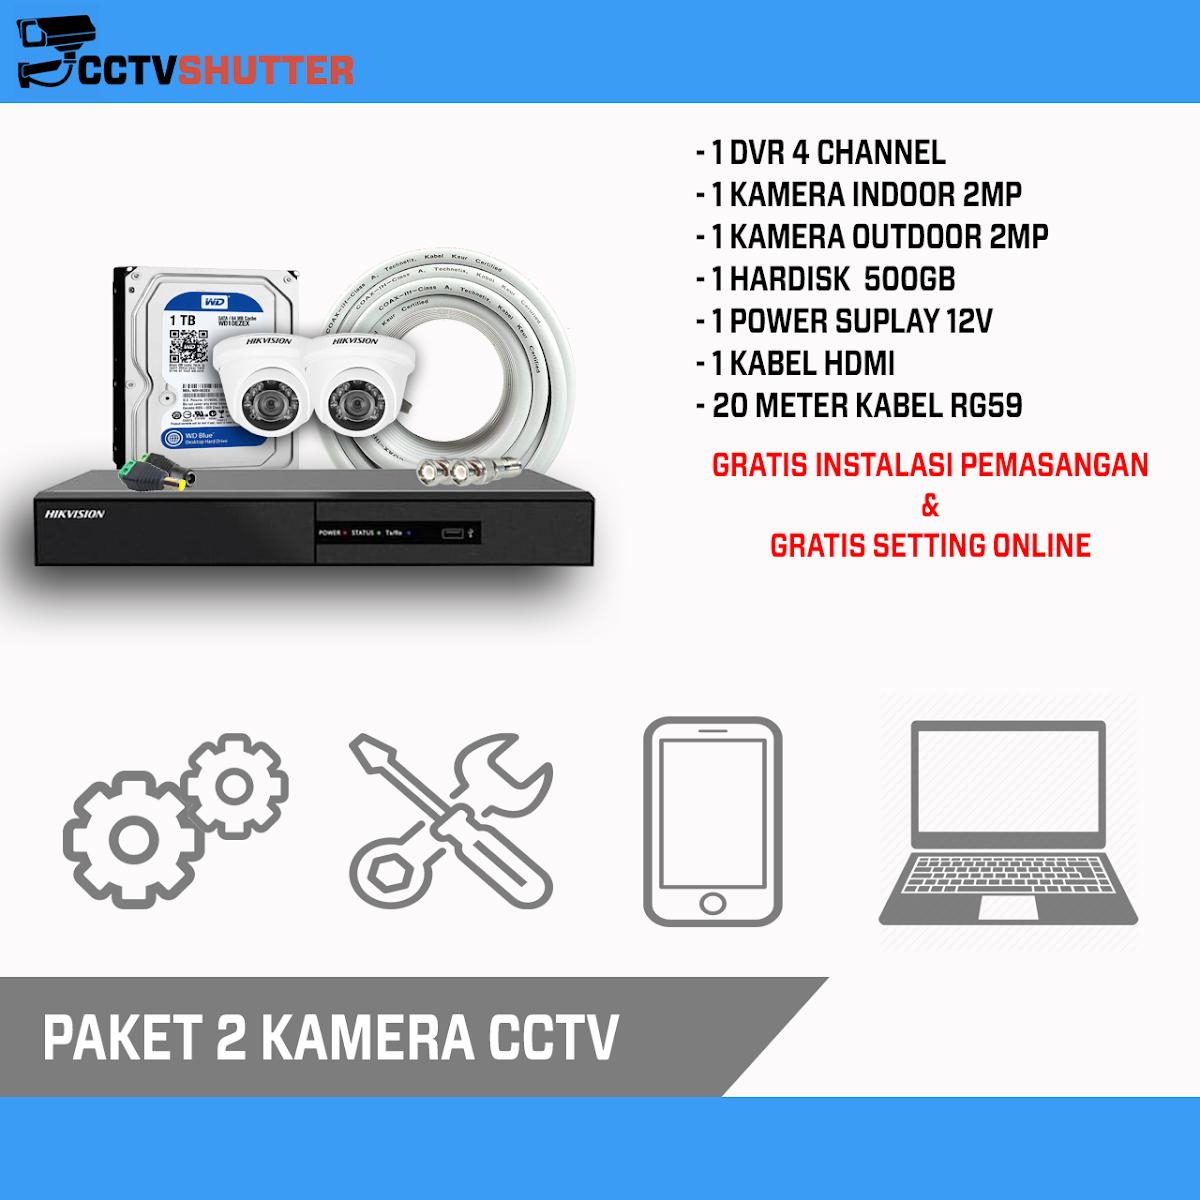 PASANG 8 KAMERA 2MP CCTV ONLINE MURAH